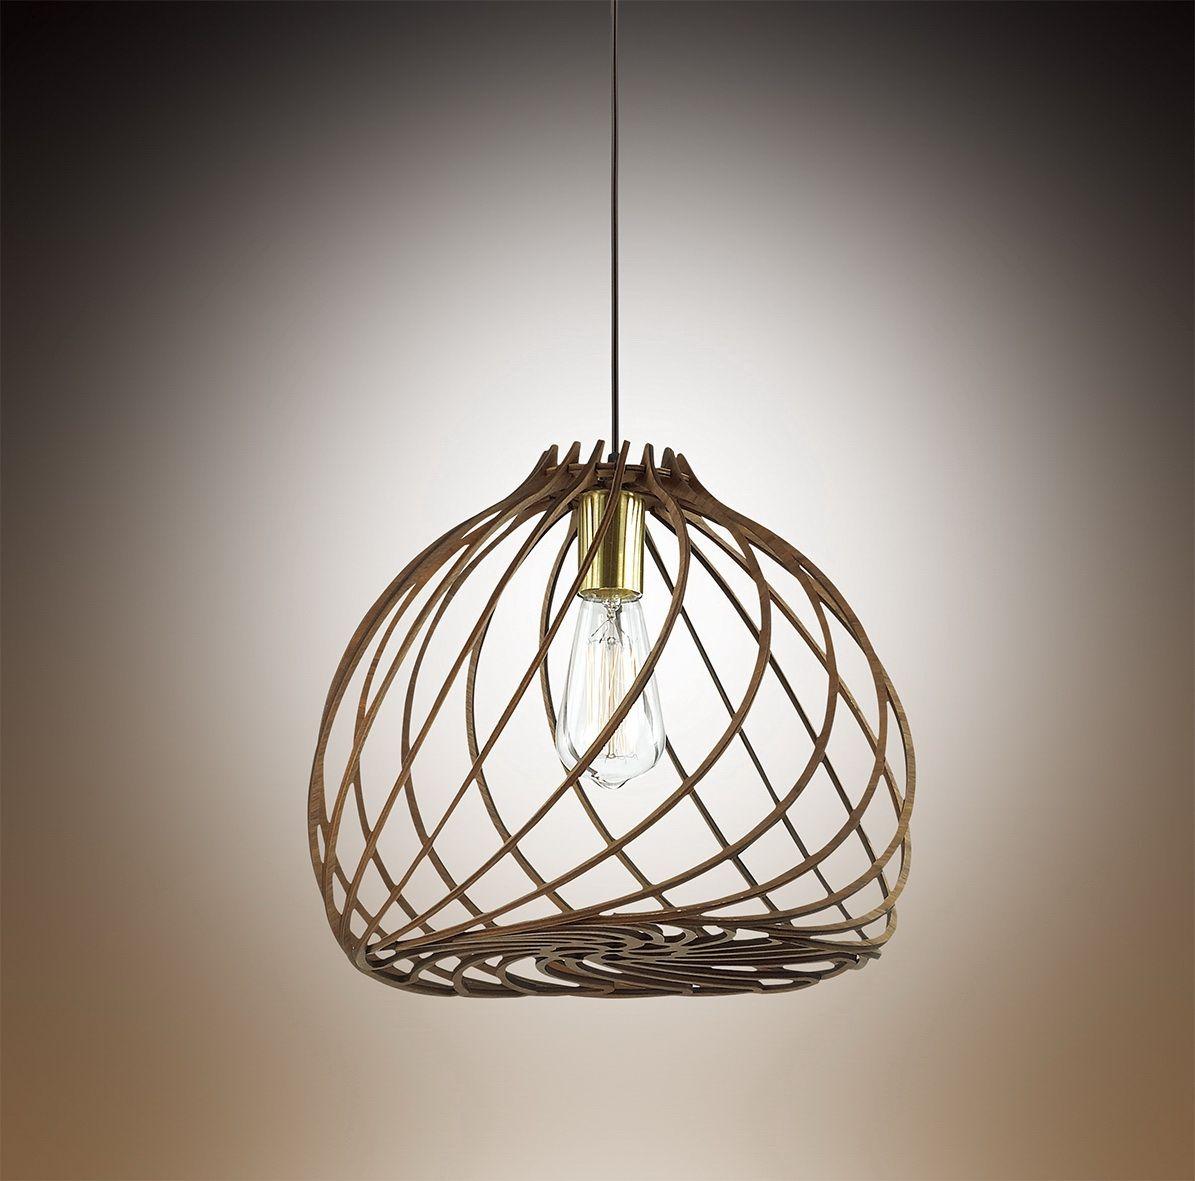 Светильник подвесной Odeon Light Spira, 1 х E27, 40W. 2893/1A2893/1A